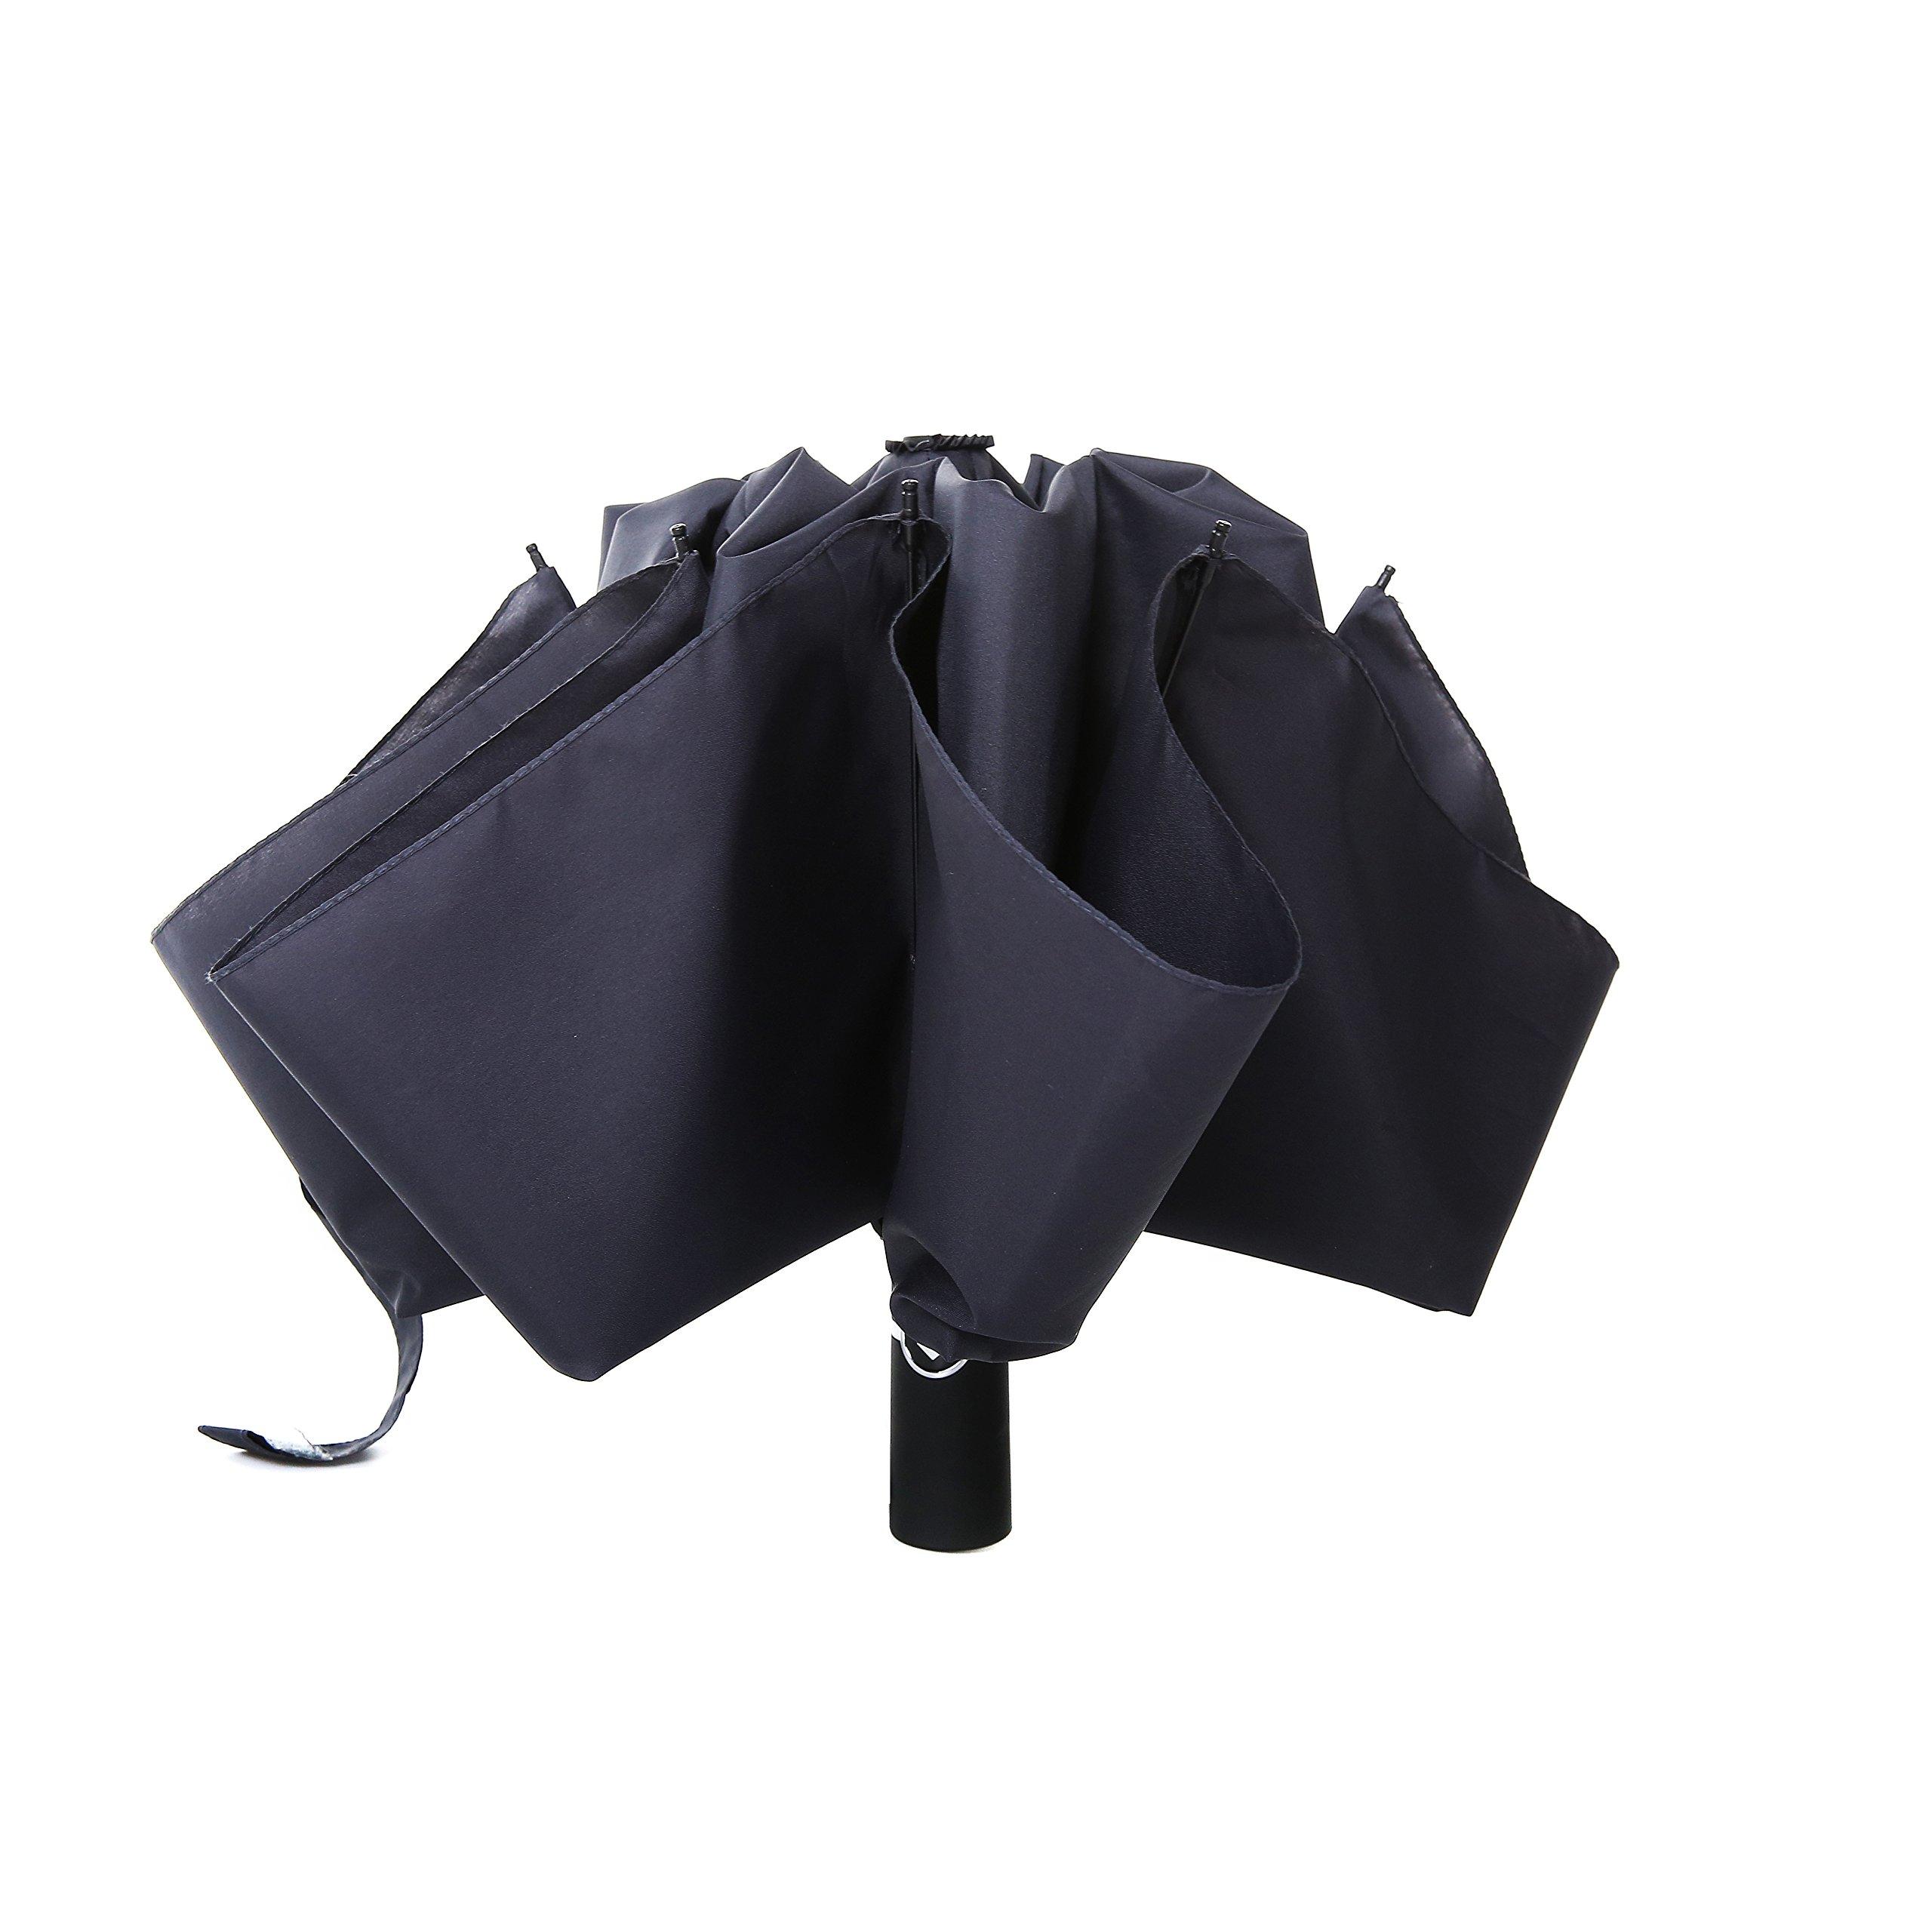 Barasol Compact Travel Umbrella Folding Reverse Umbrella Inverted Golf Automatic